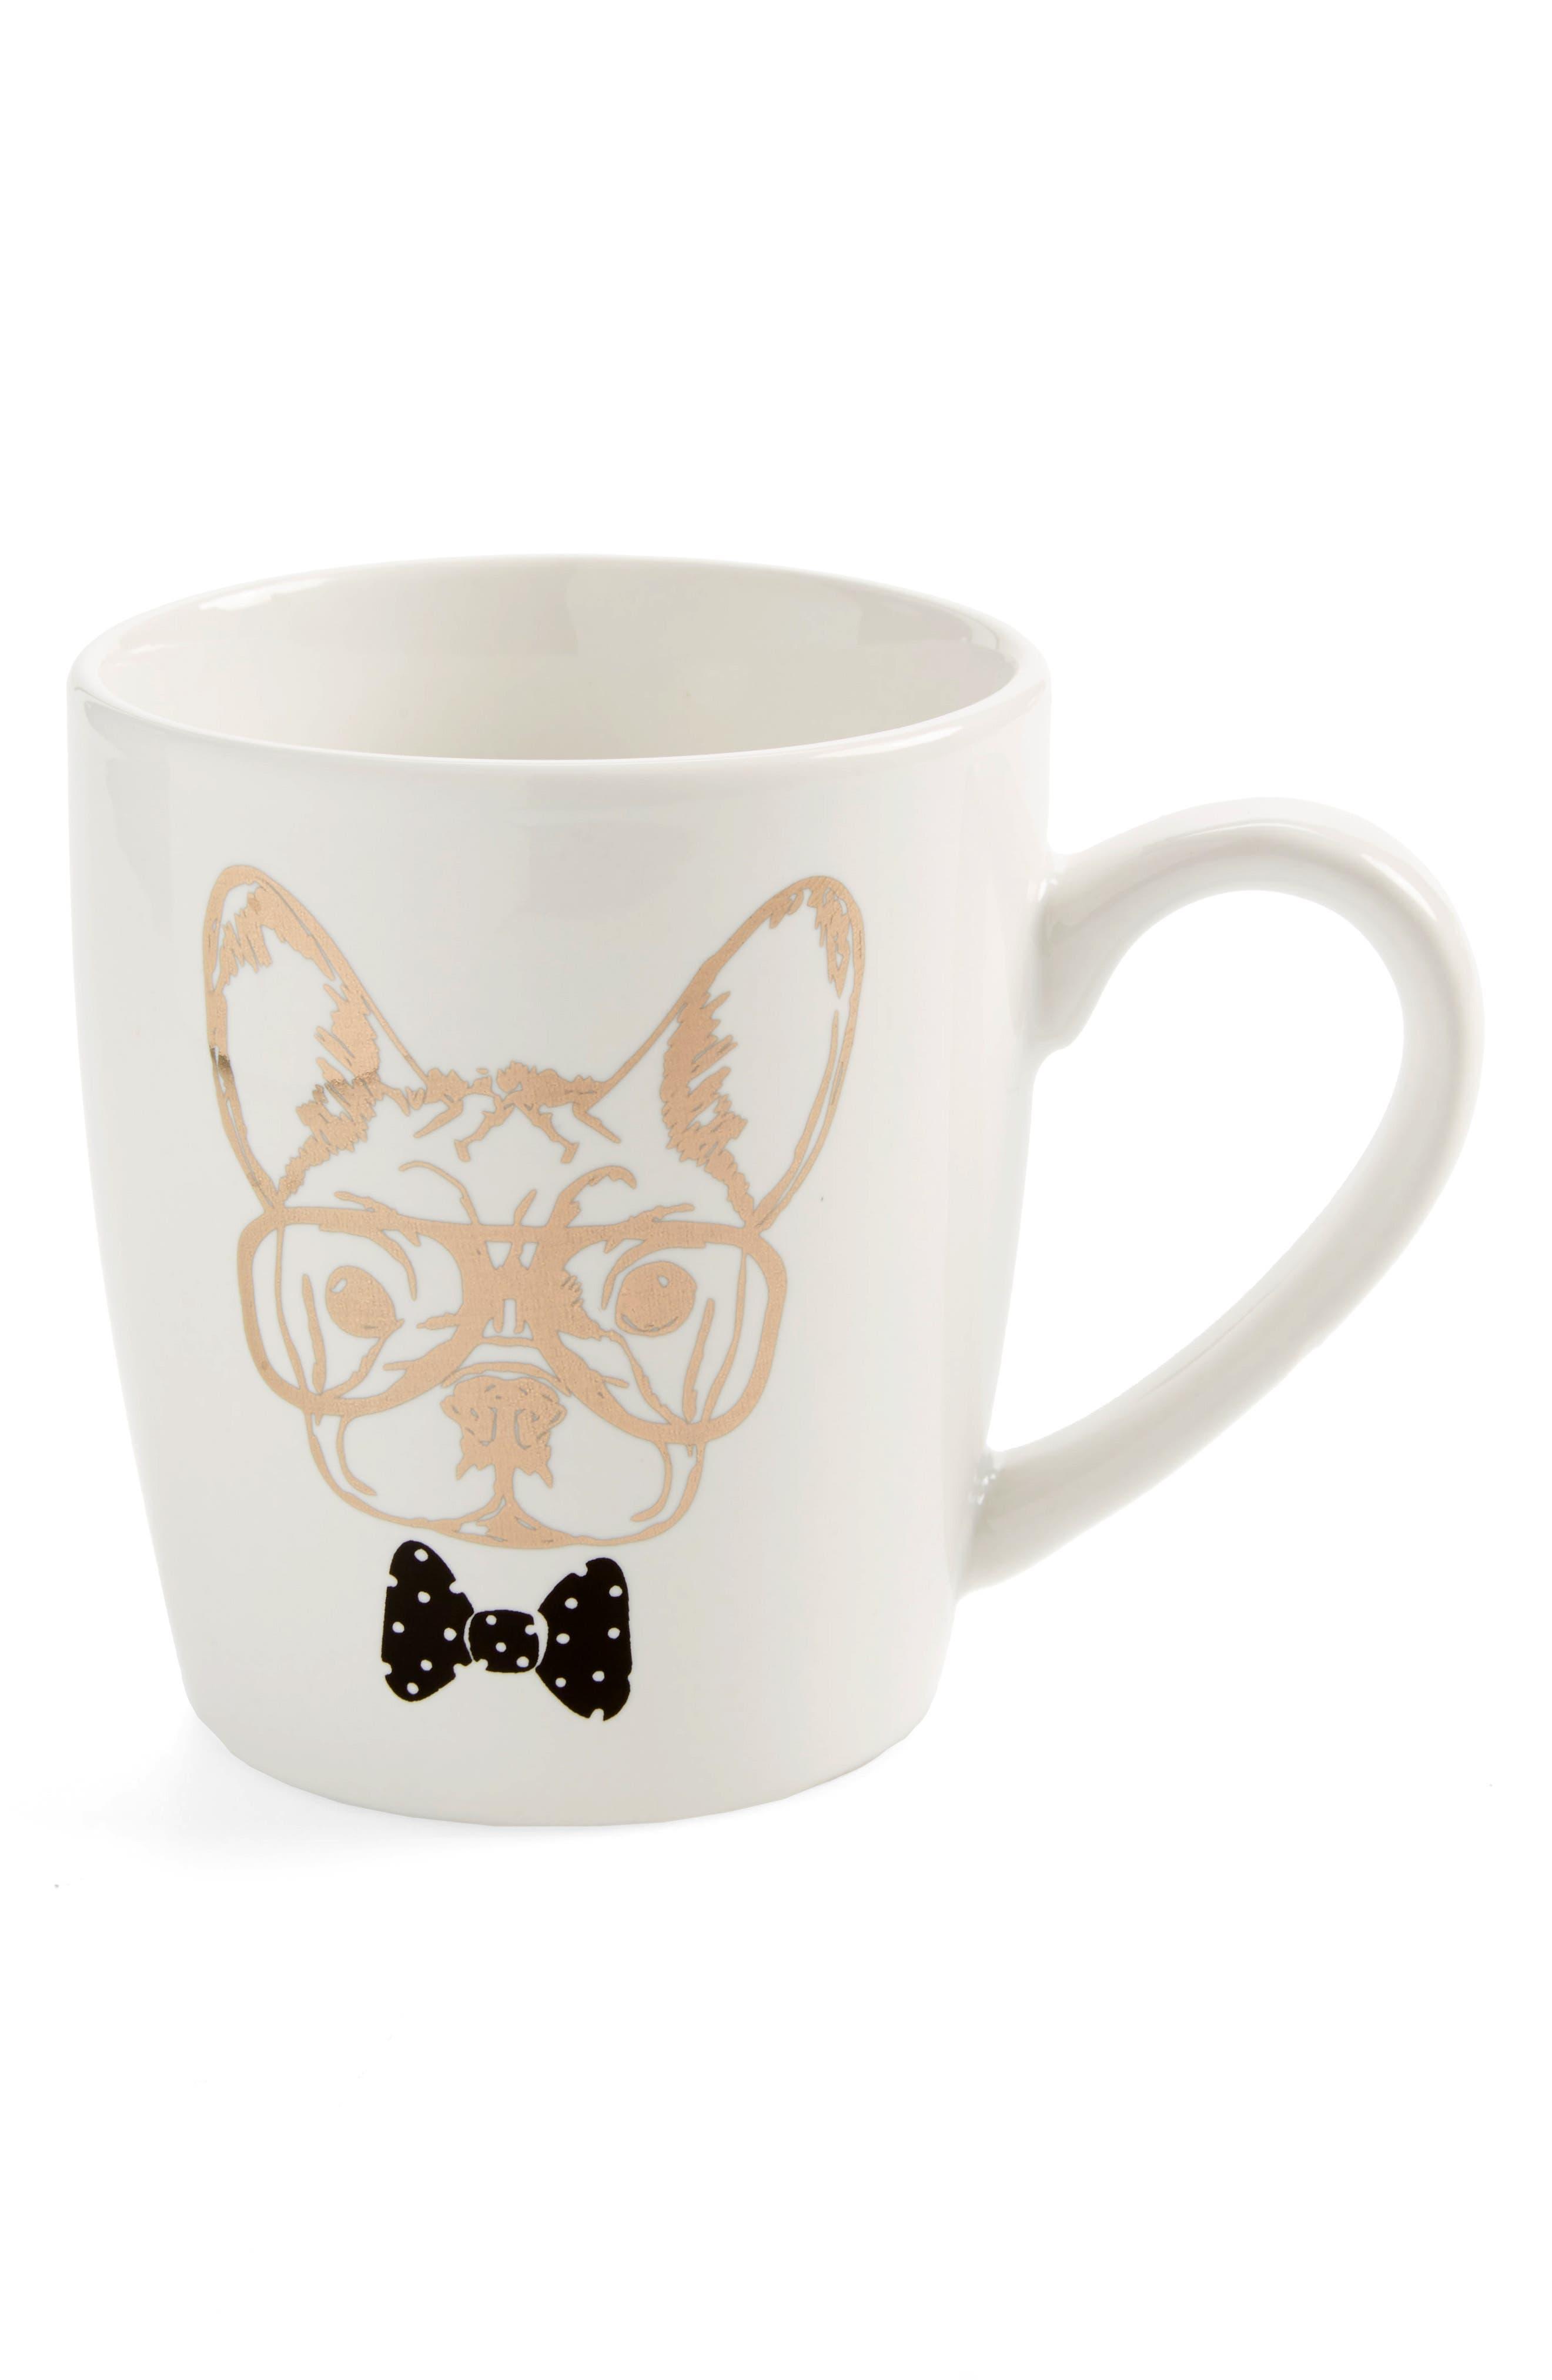 American Atelier French Bulldog Mug